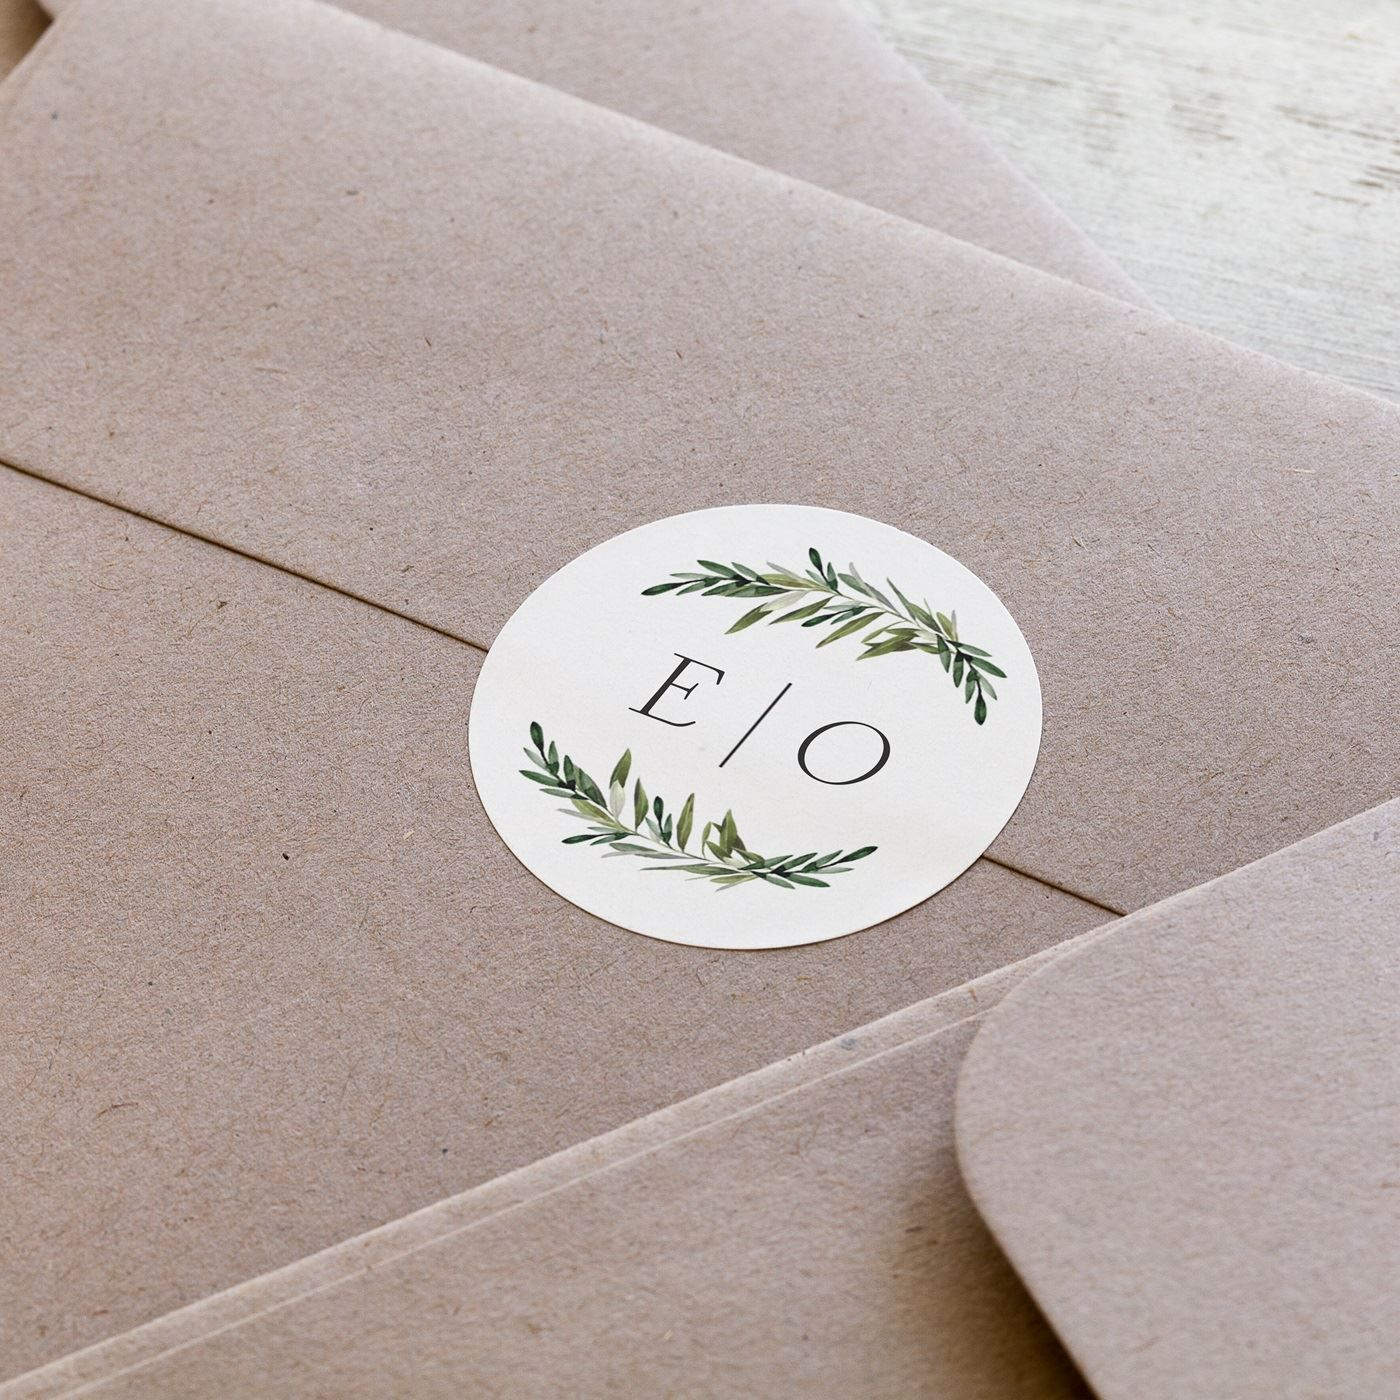 Custom Envelope Seals Wedding Envelope Seals Vistaprint Envelope Seal Stickers Wedding Envelopes Envelope Seals